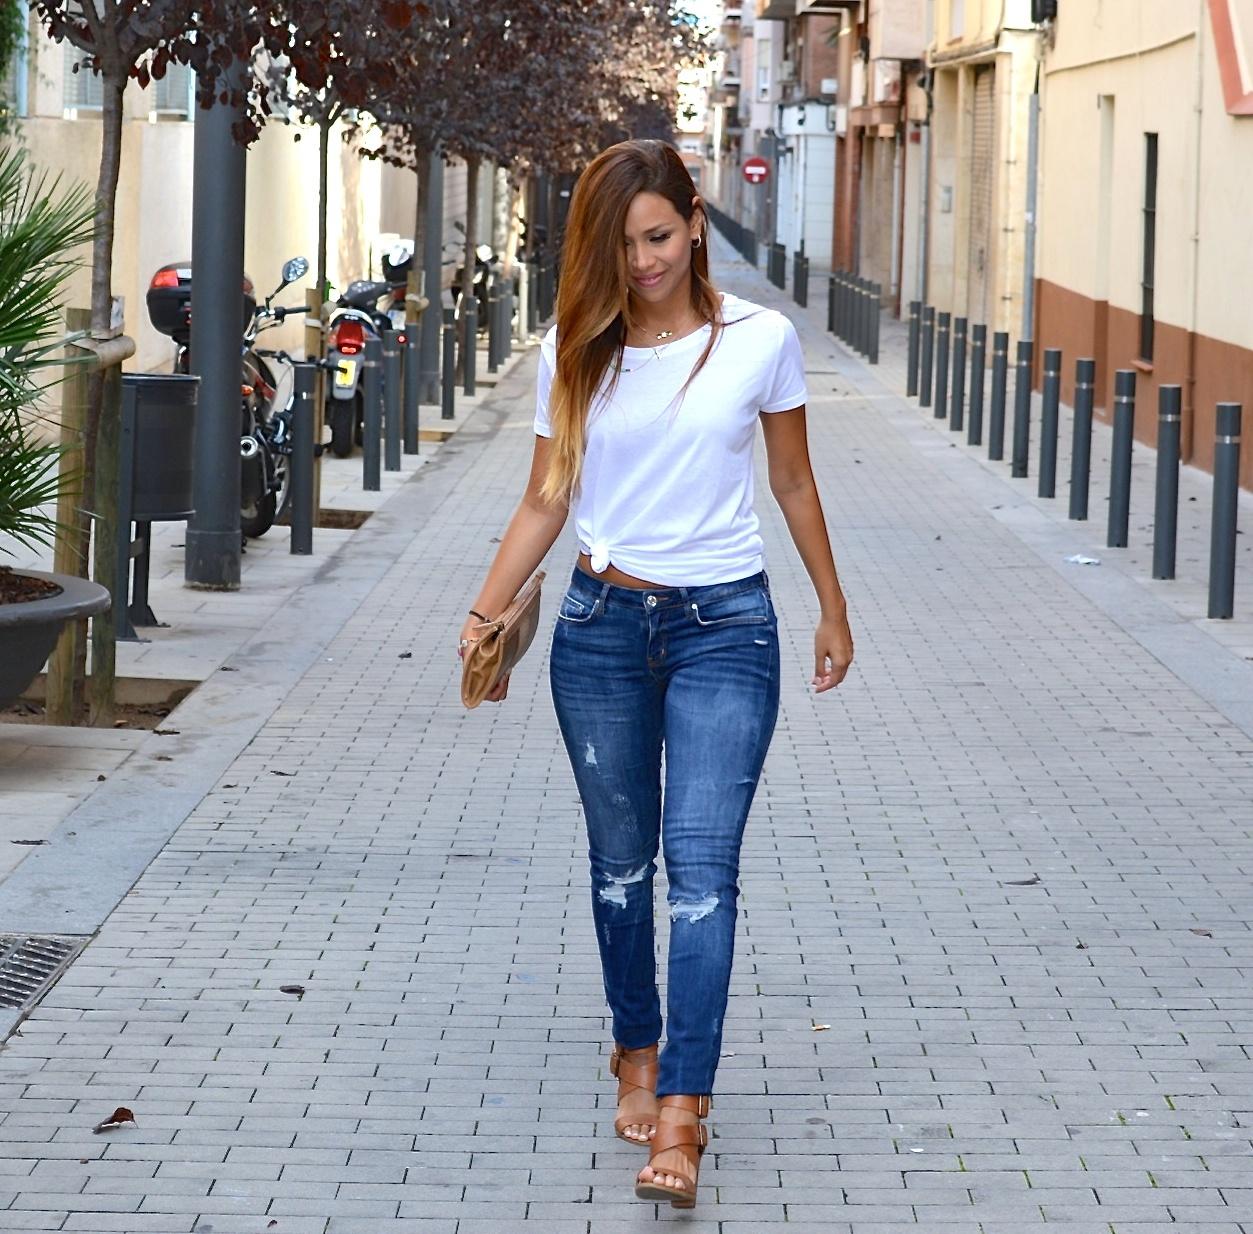 Blue jeans, denim, tejanos…